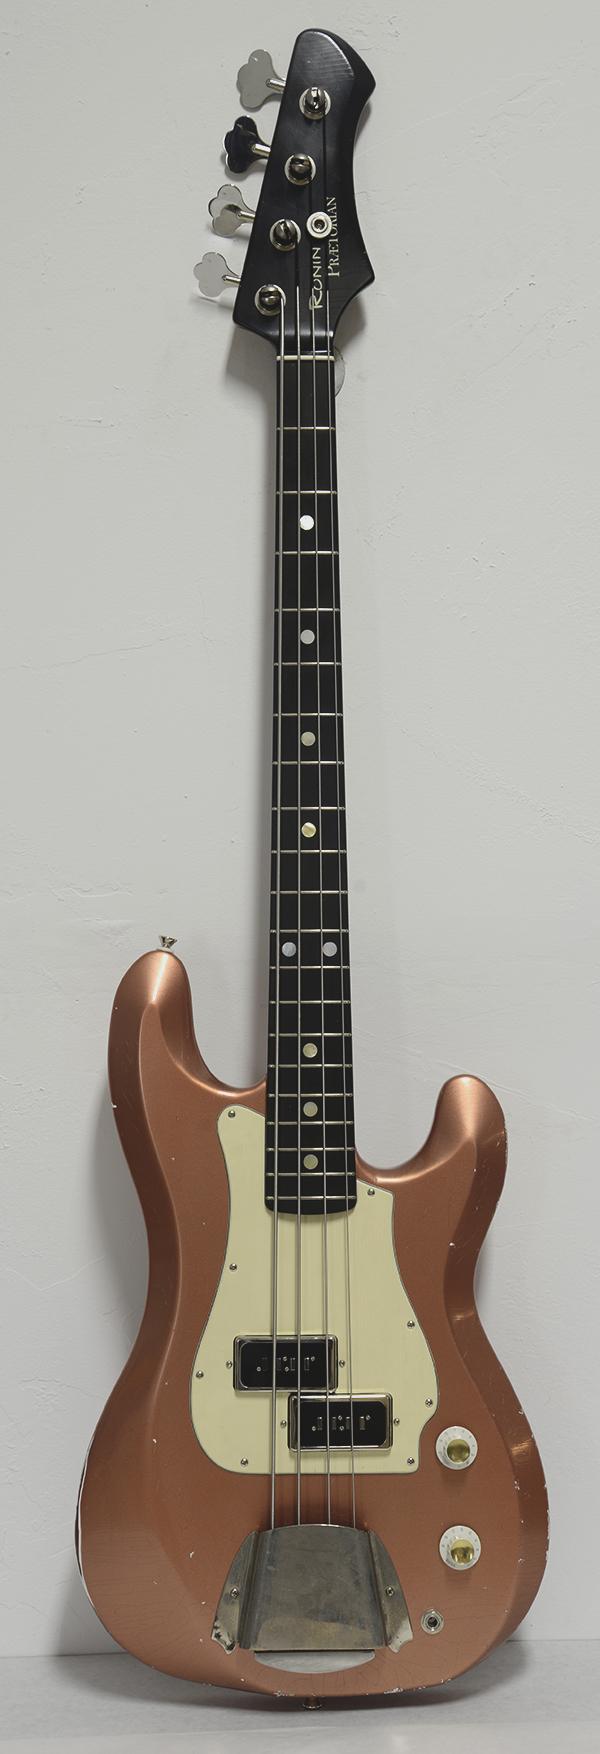 Ronin Prætorian Bass in Suntan Copper